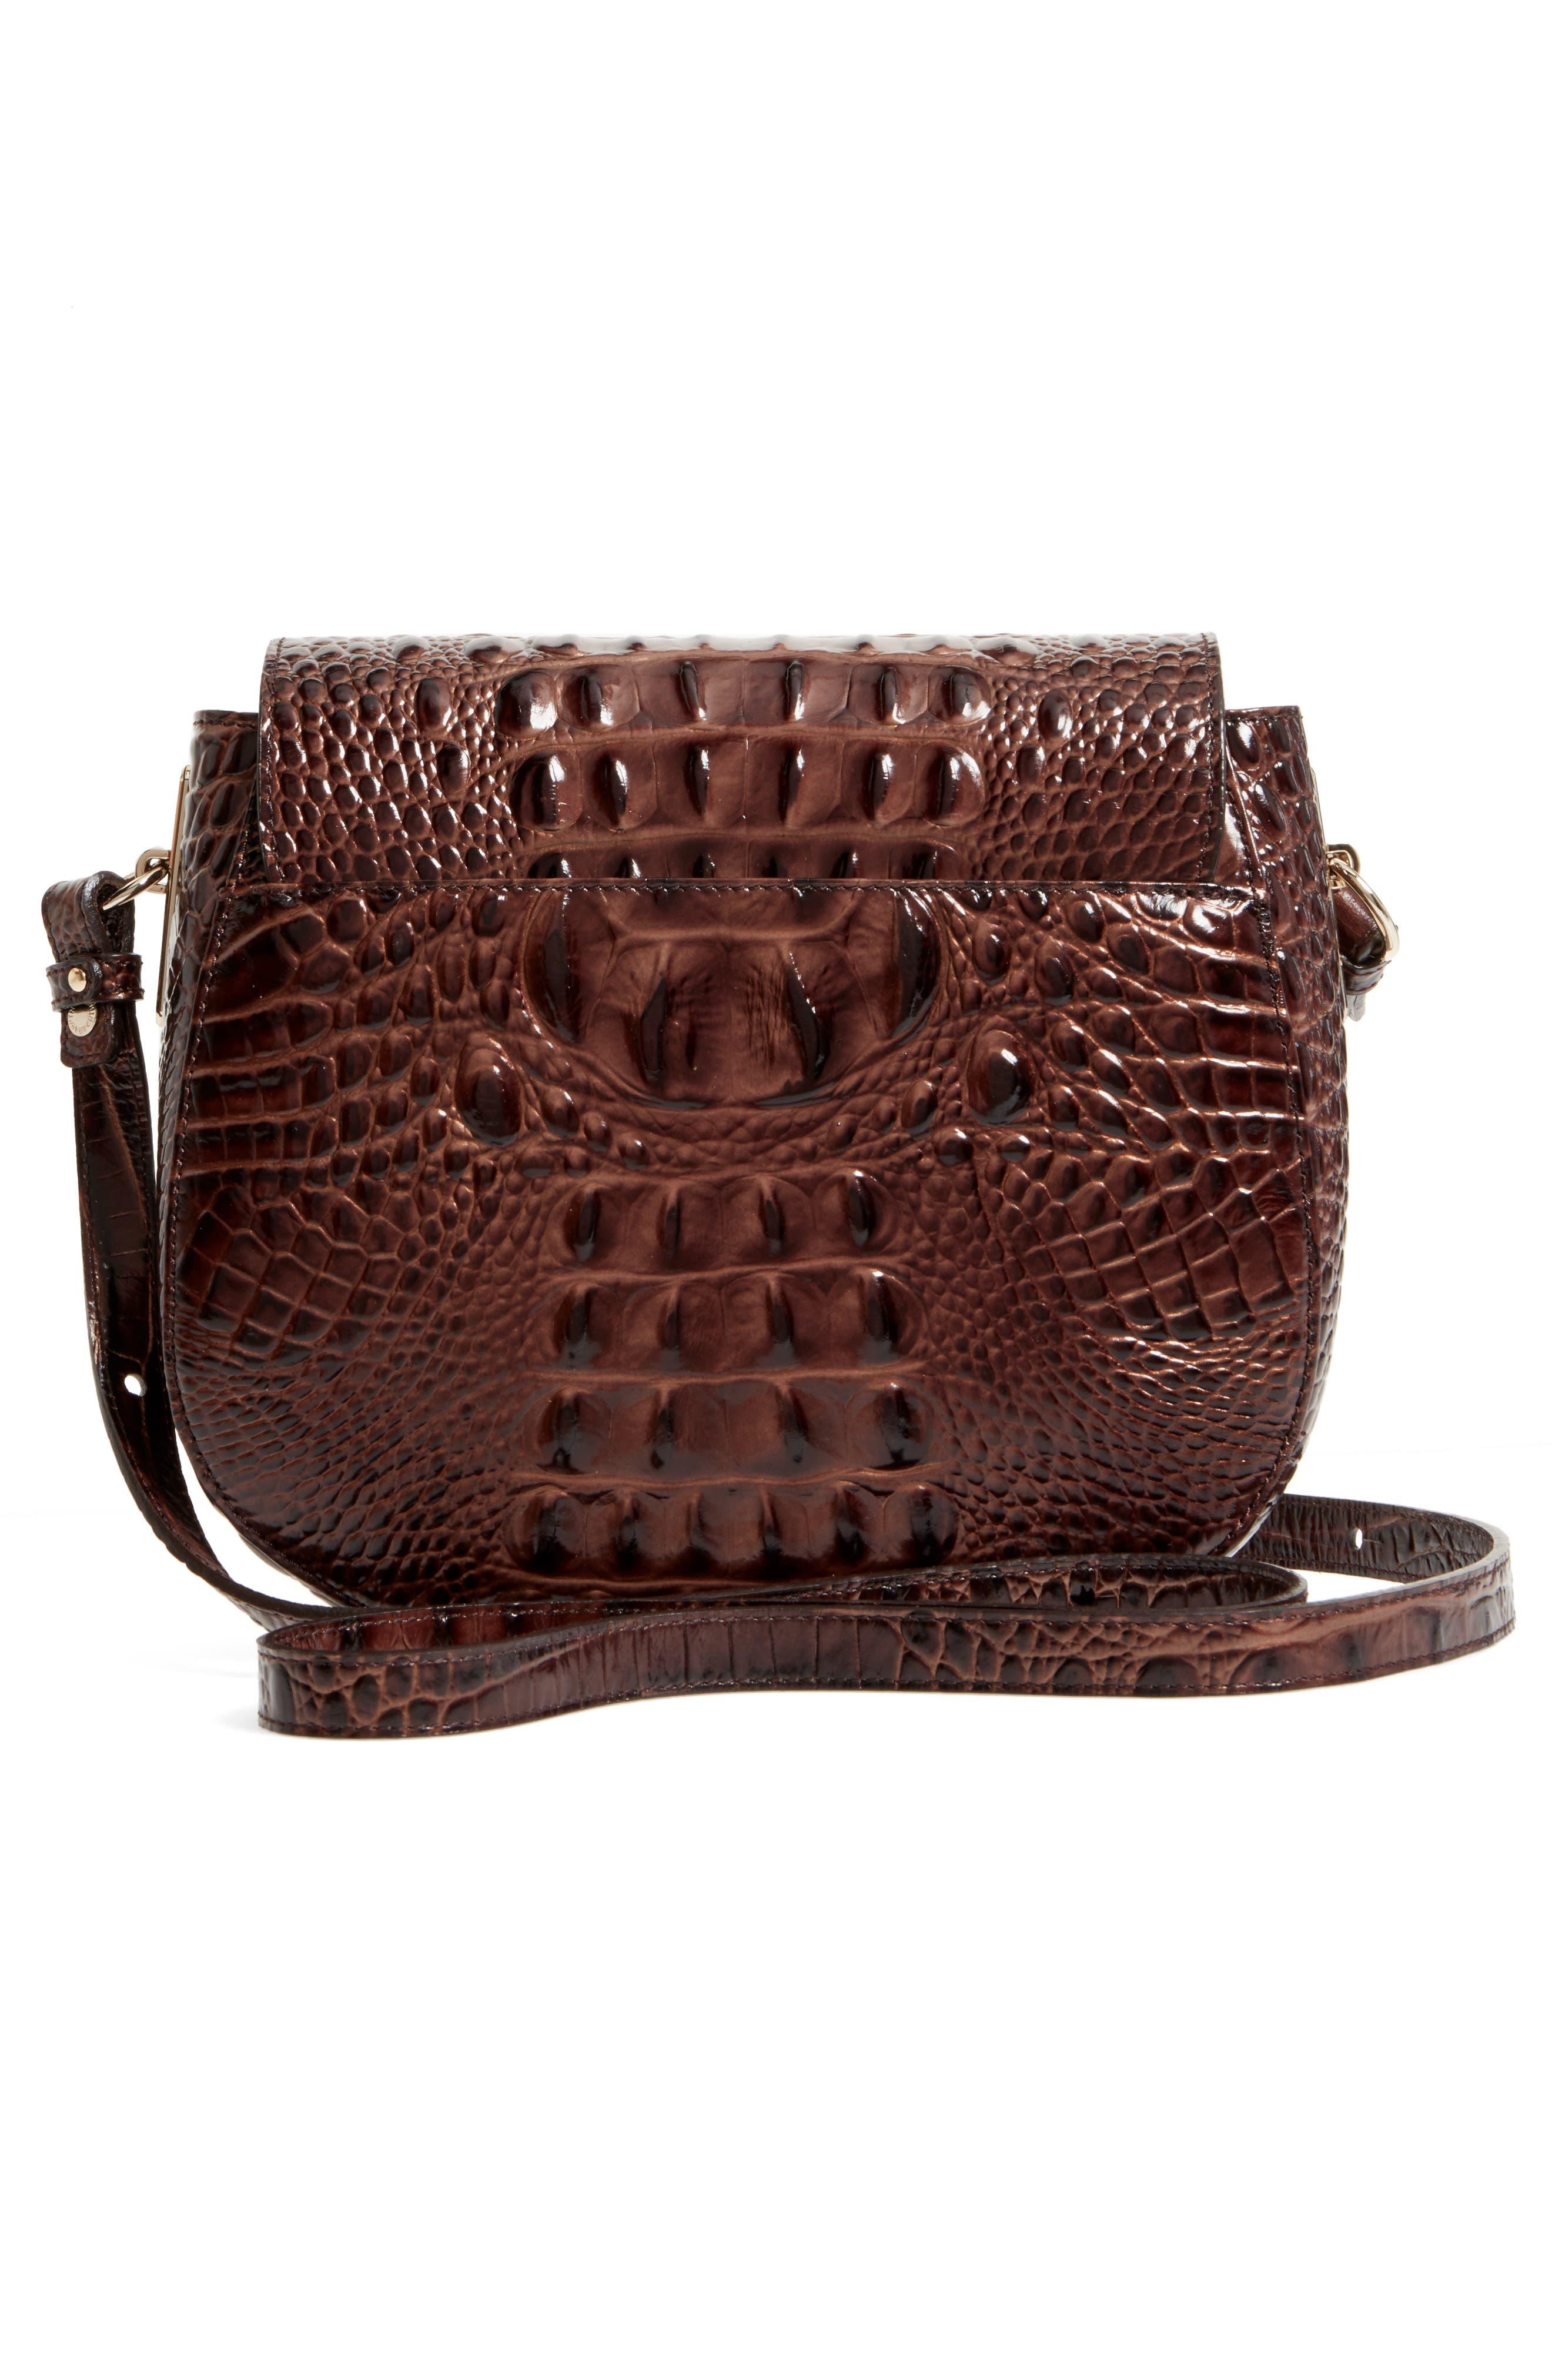 Melbourne - Lizzie Leather Crossbody Bag,                             Alternate thumbnail 13, color,